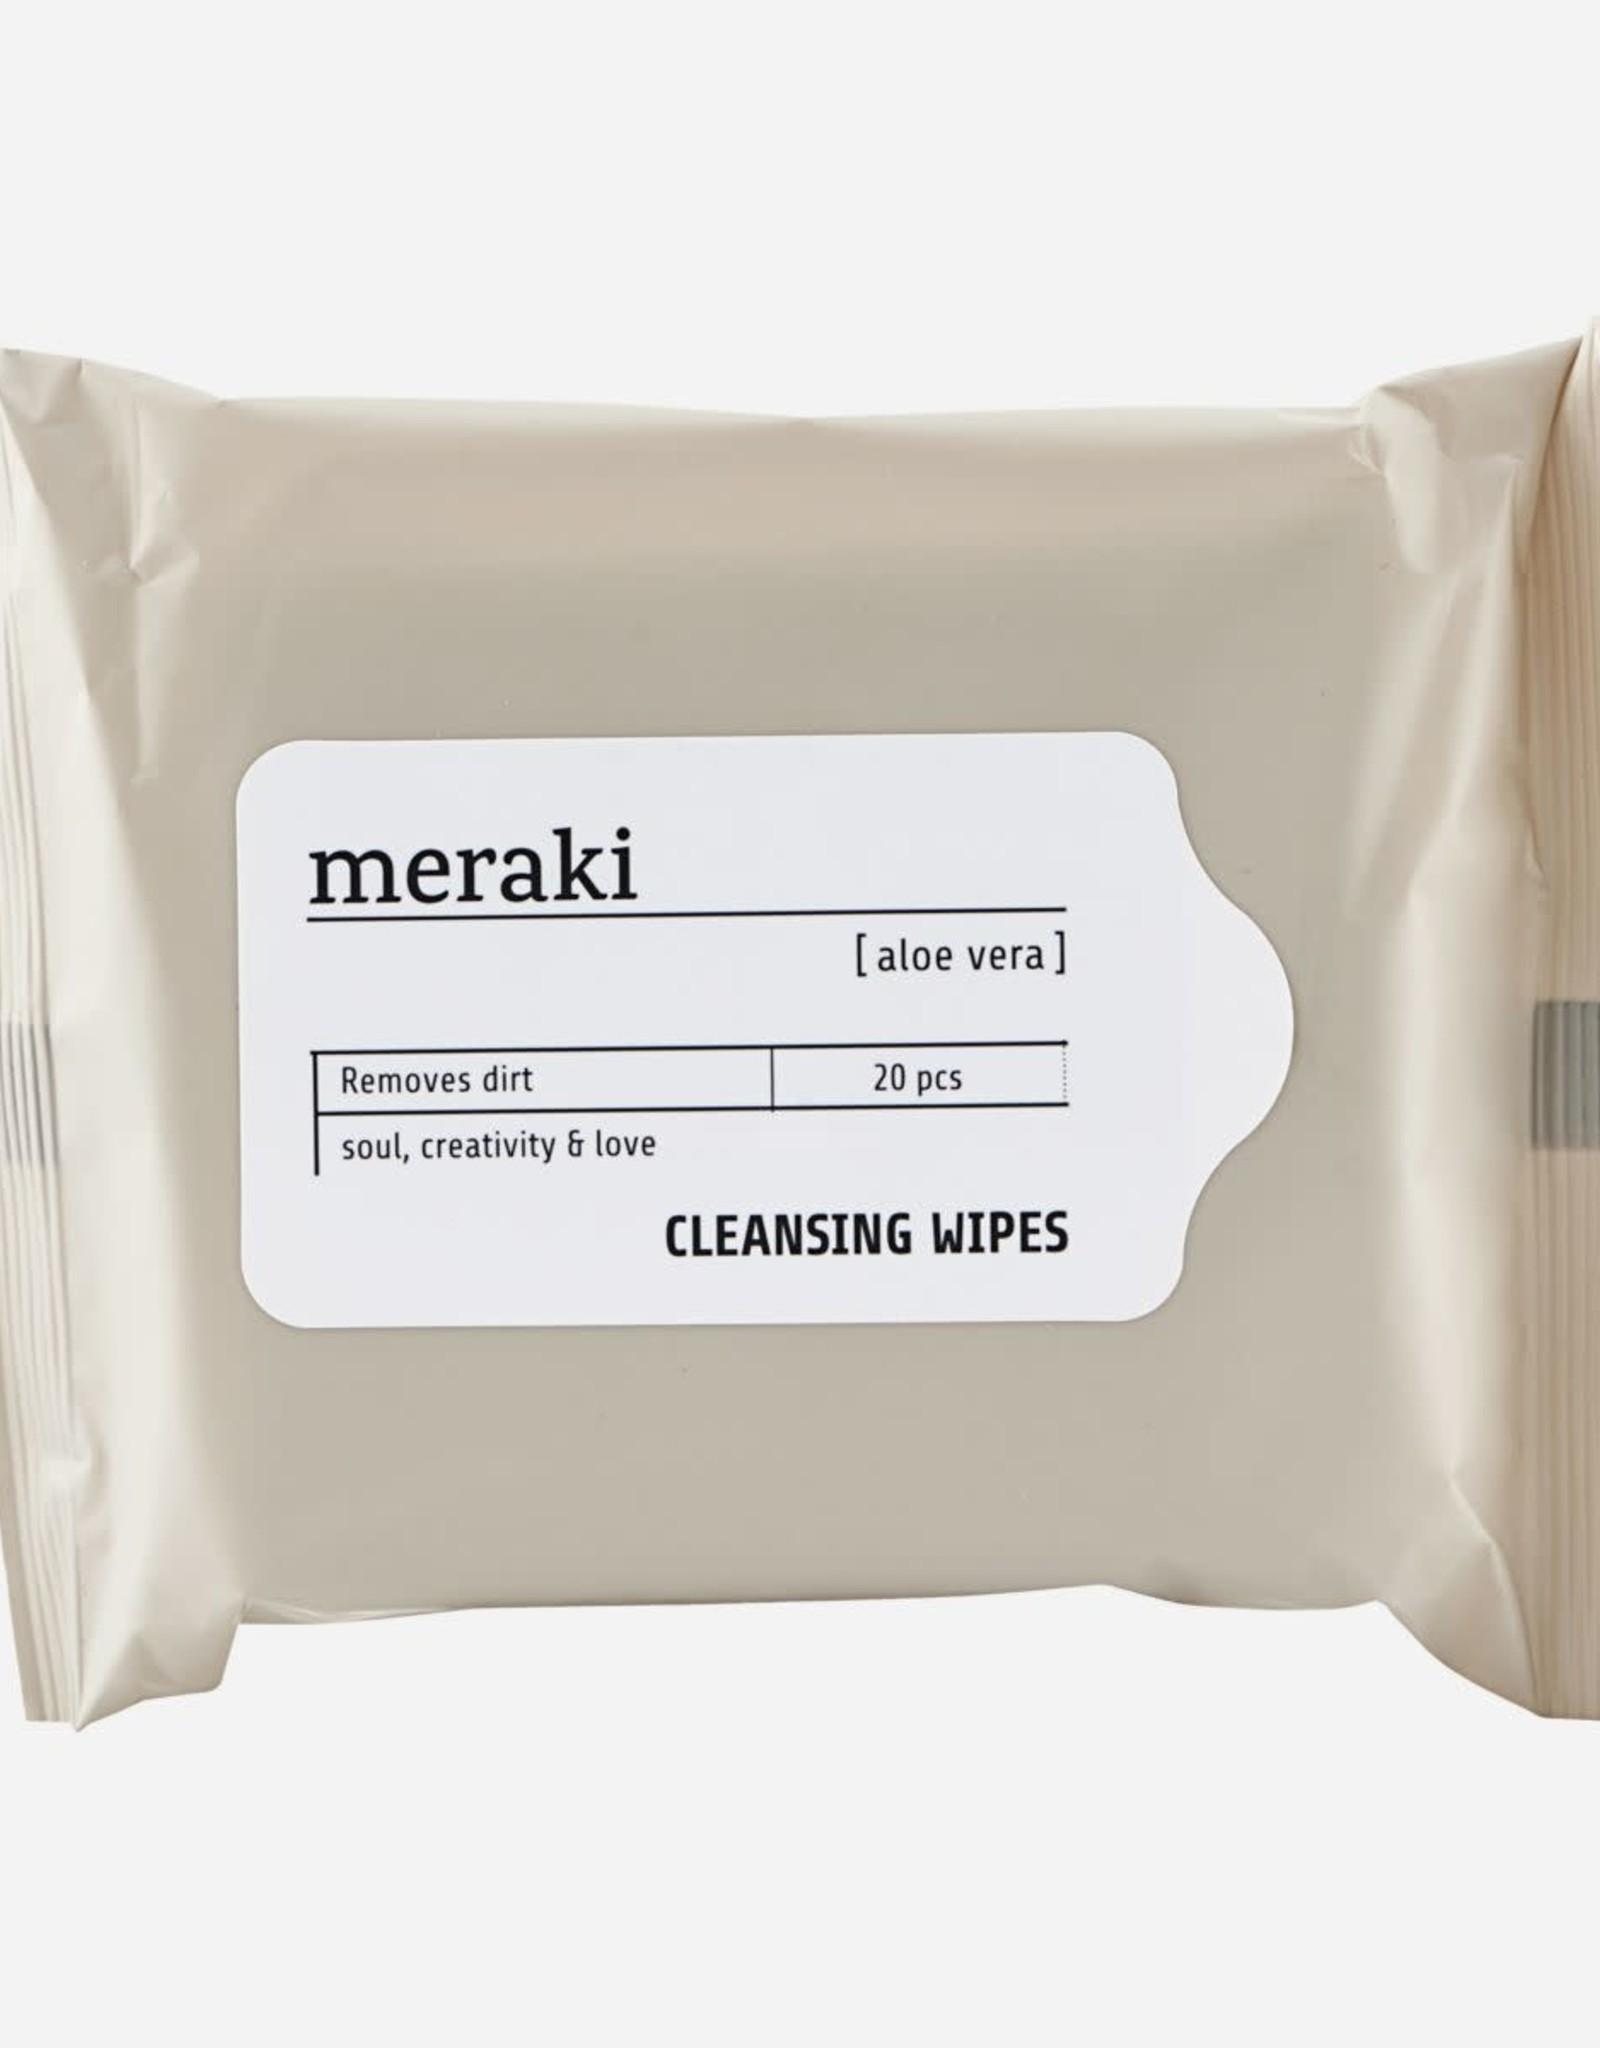 Meraki Refreshing wipes, Aloe vera